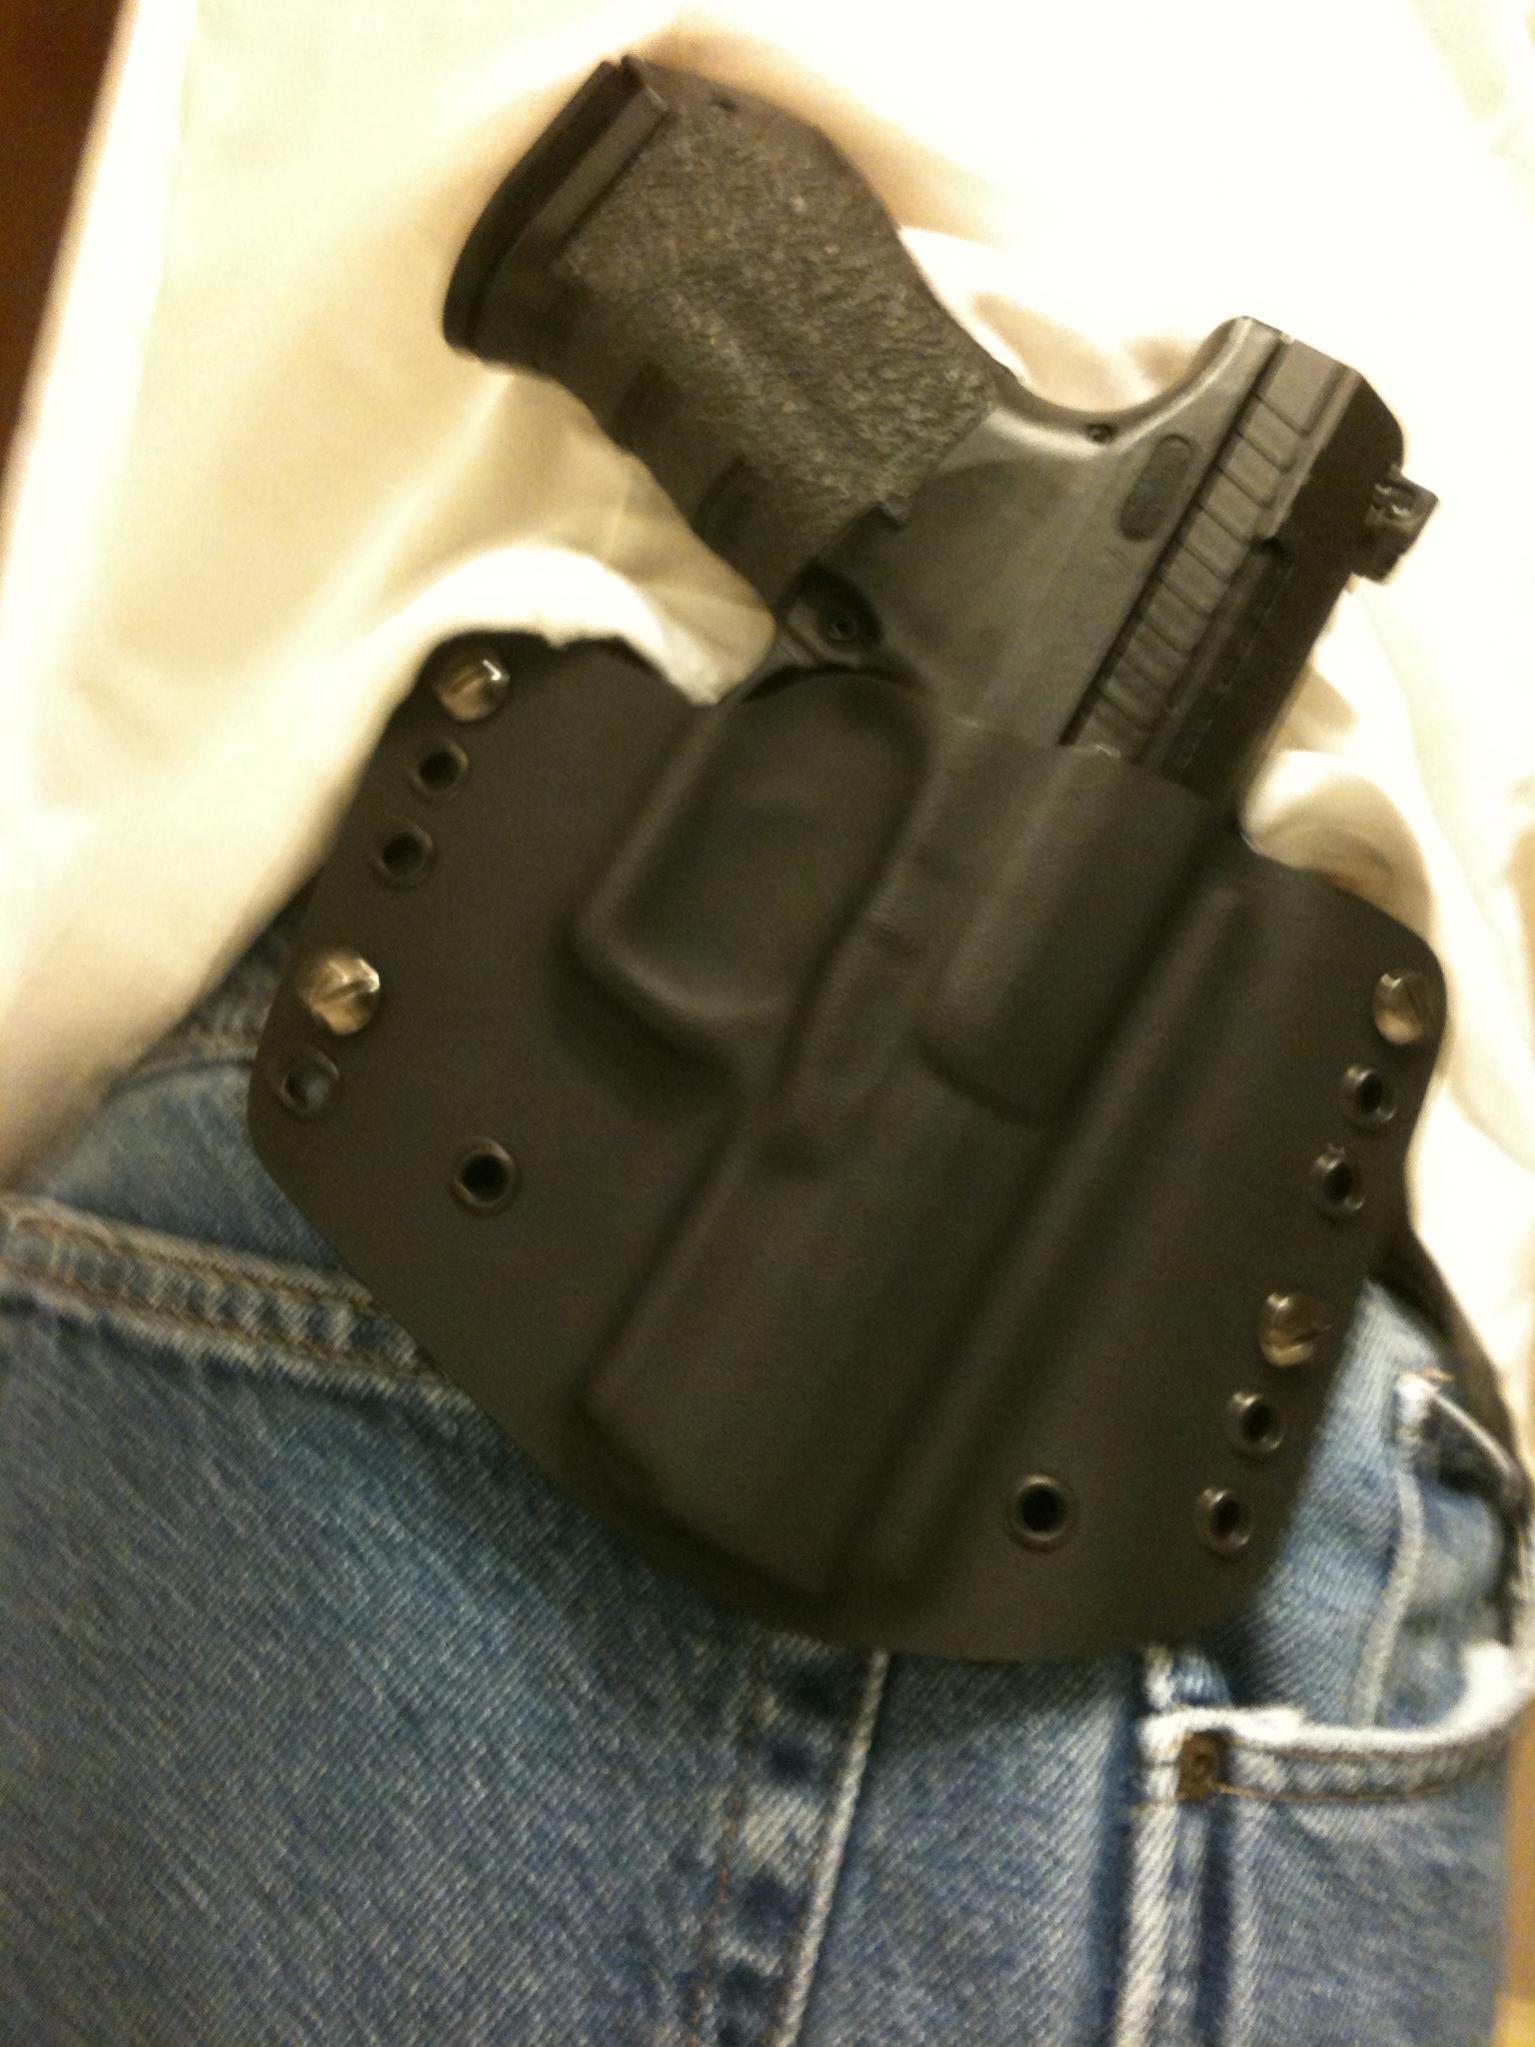 Help gotta buy a holster I don't need-new-holster2.jpg